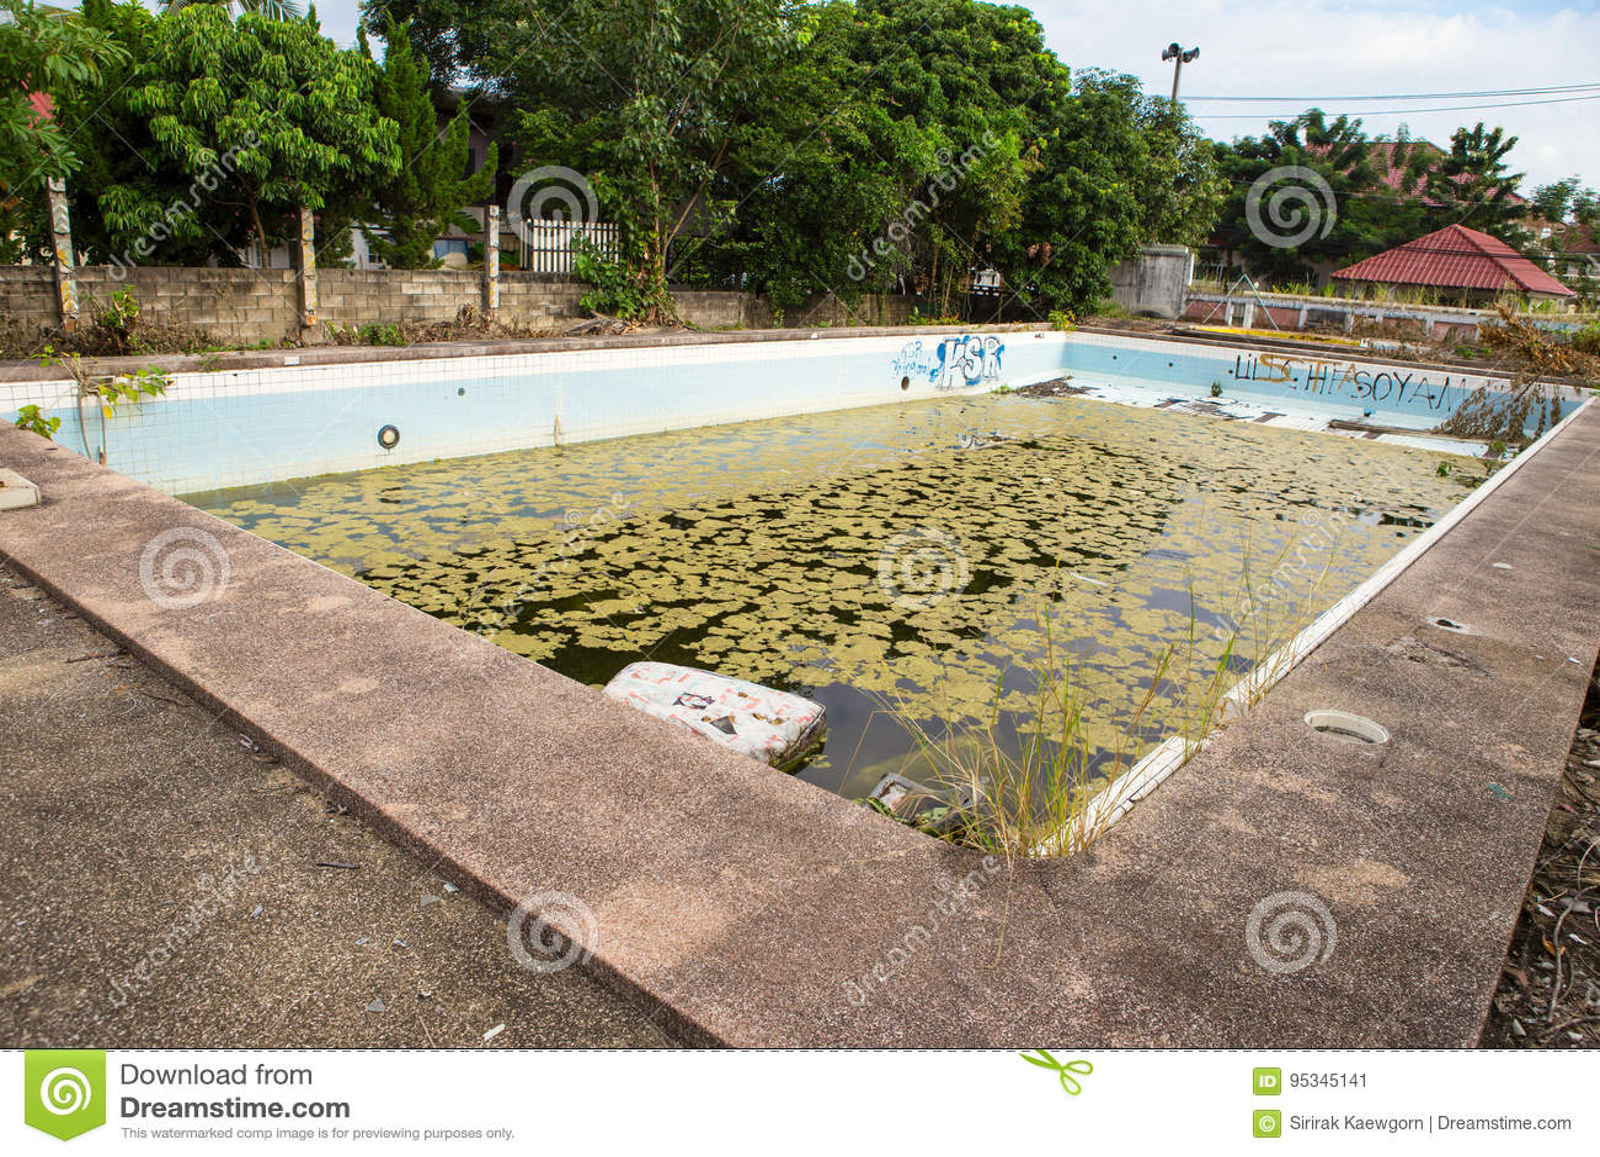 Old Abandoned Swimming Pool Stock Image Image Of Concrete Damage 95345141